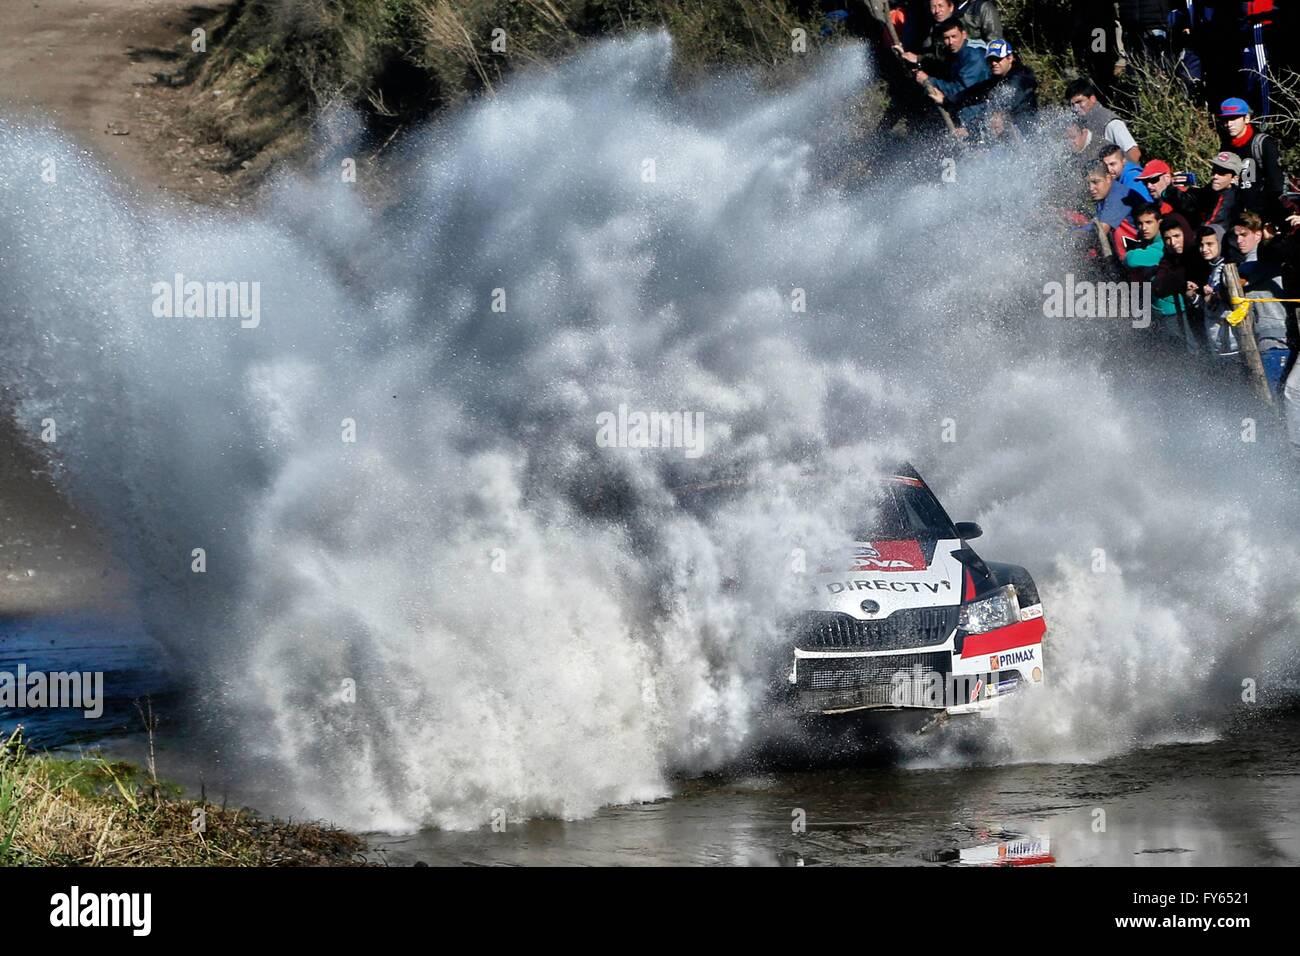 Argentina. 22 apr, 2016. WRC Motorsport WRC Rally d'Argentina. FUCHS Credito: Azione Sport Plus/Alamy Live News Immagini Stock